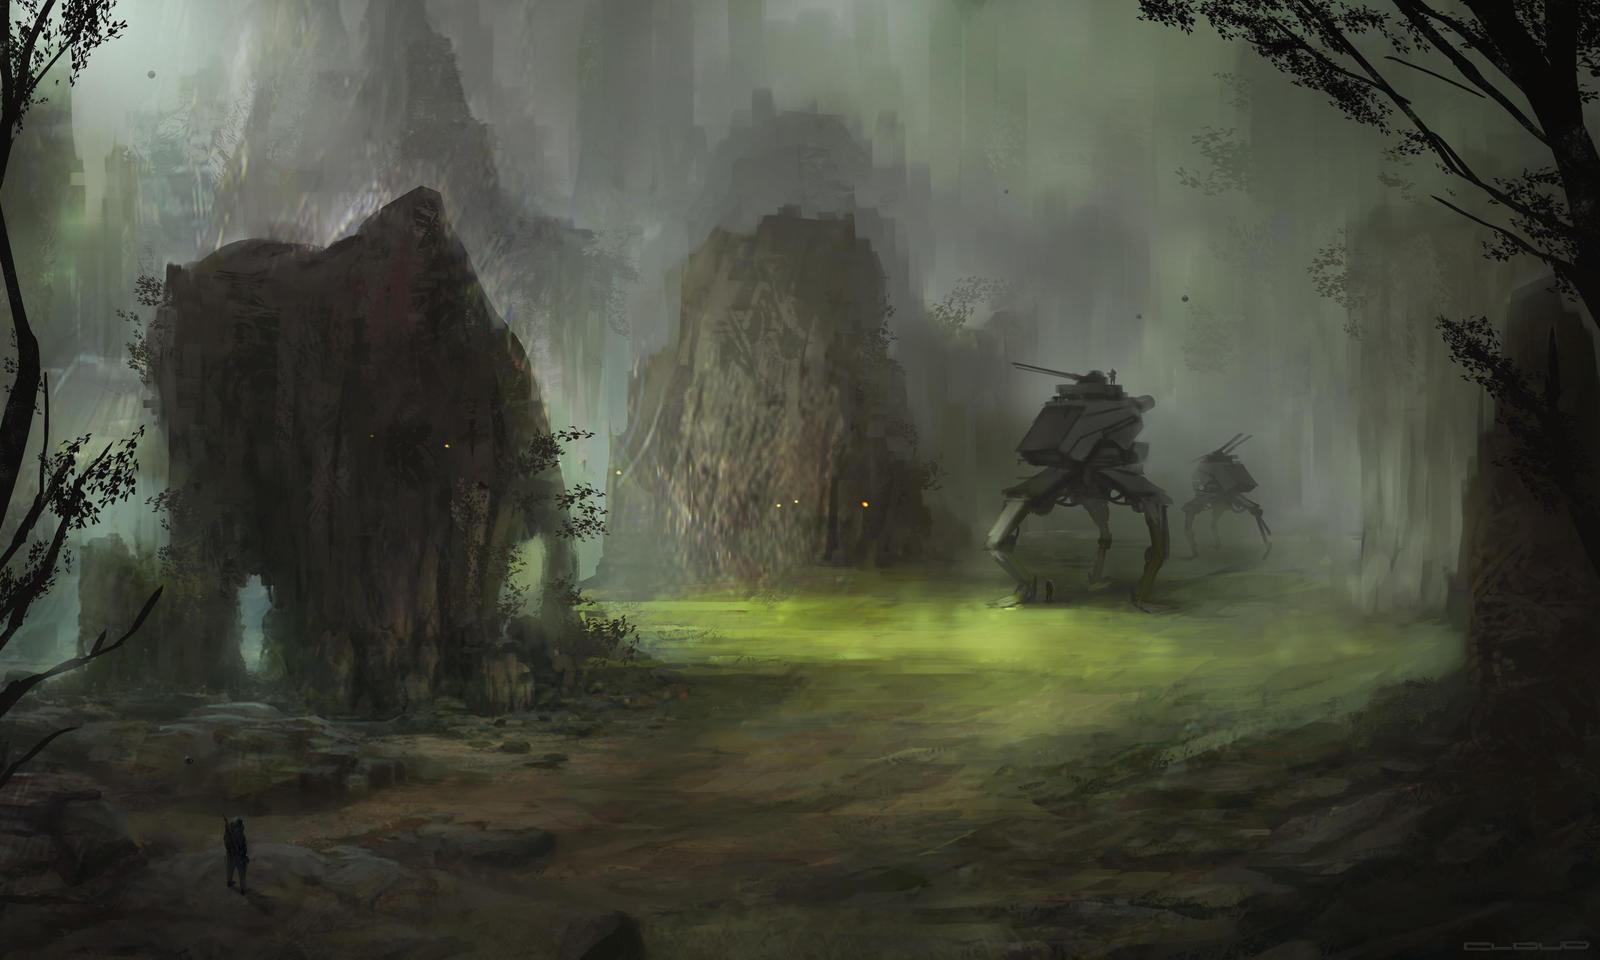 Bots by Darkcloud013